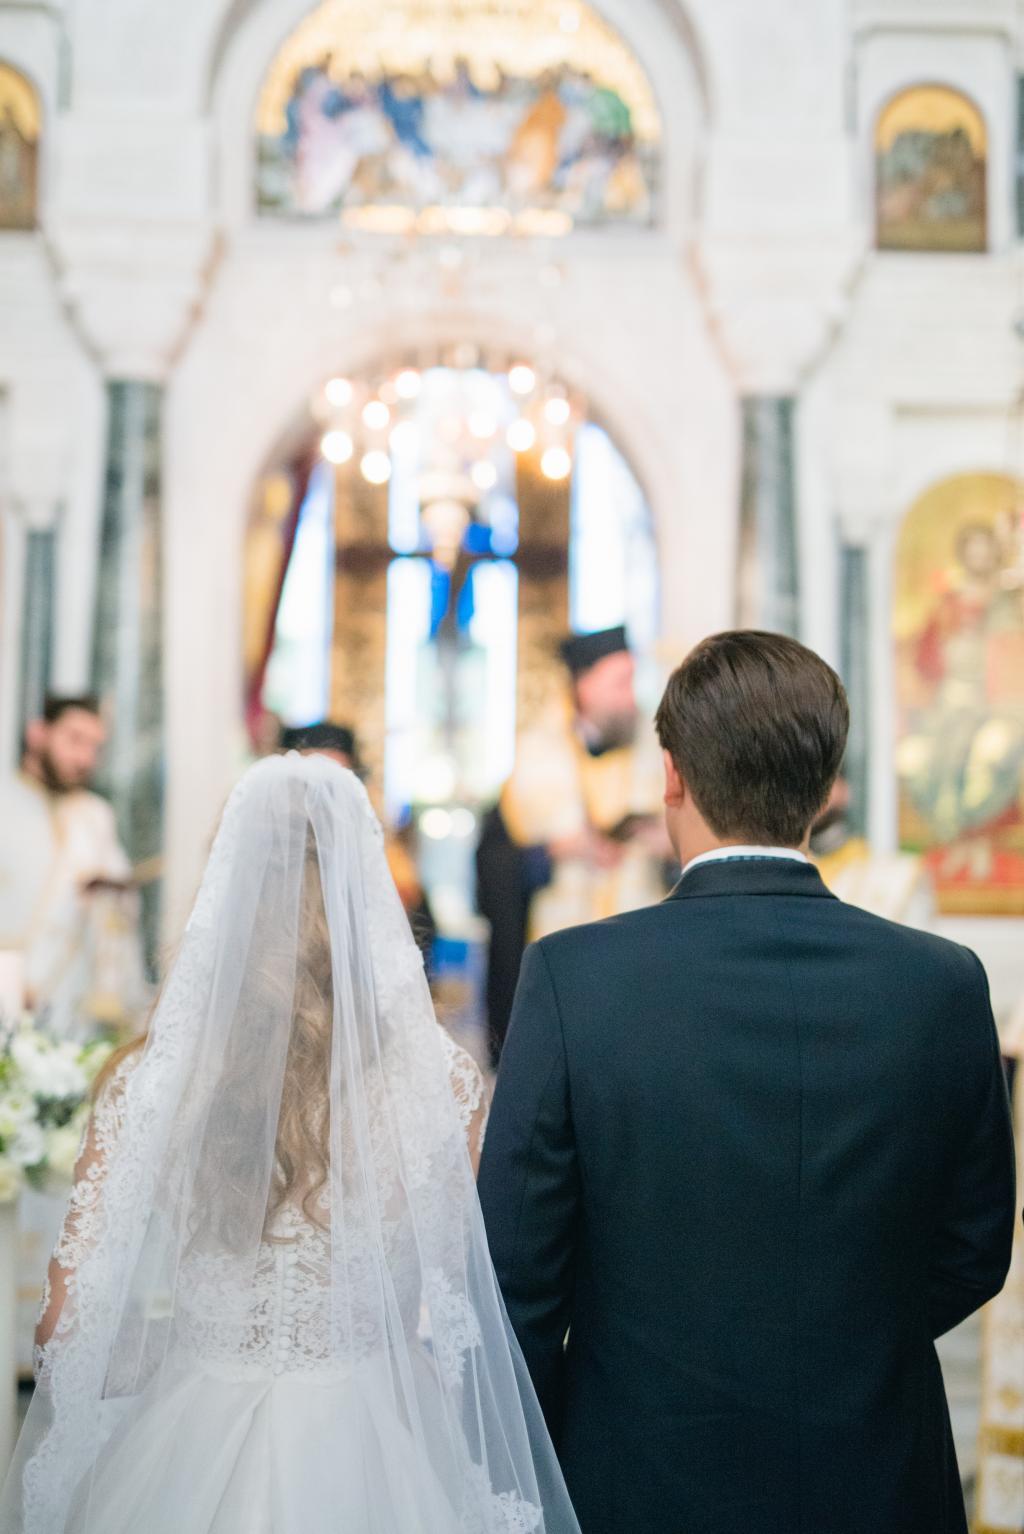 M&K Kavouri wedding - Image 10